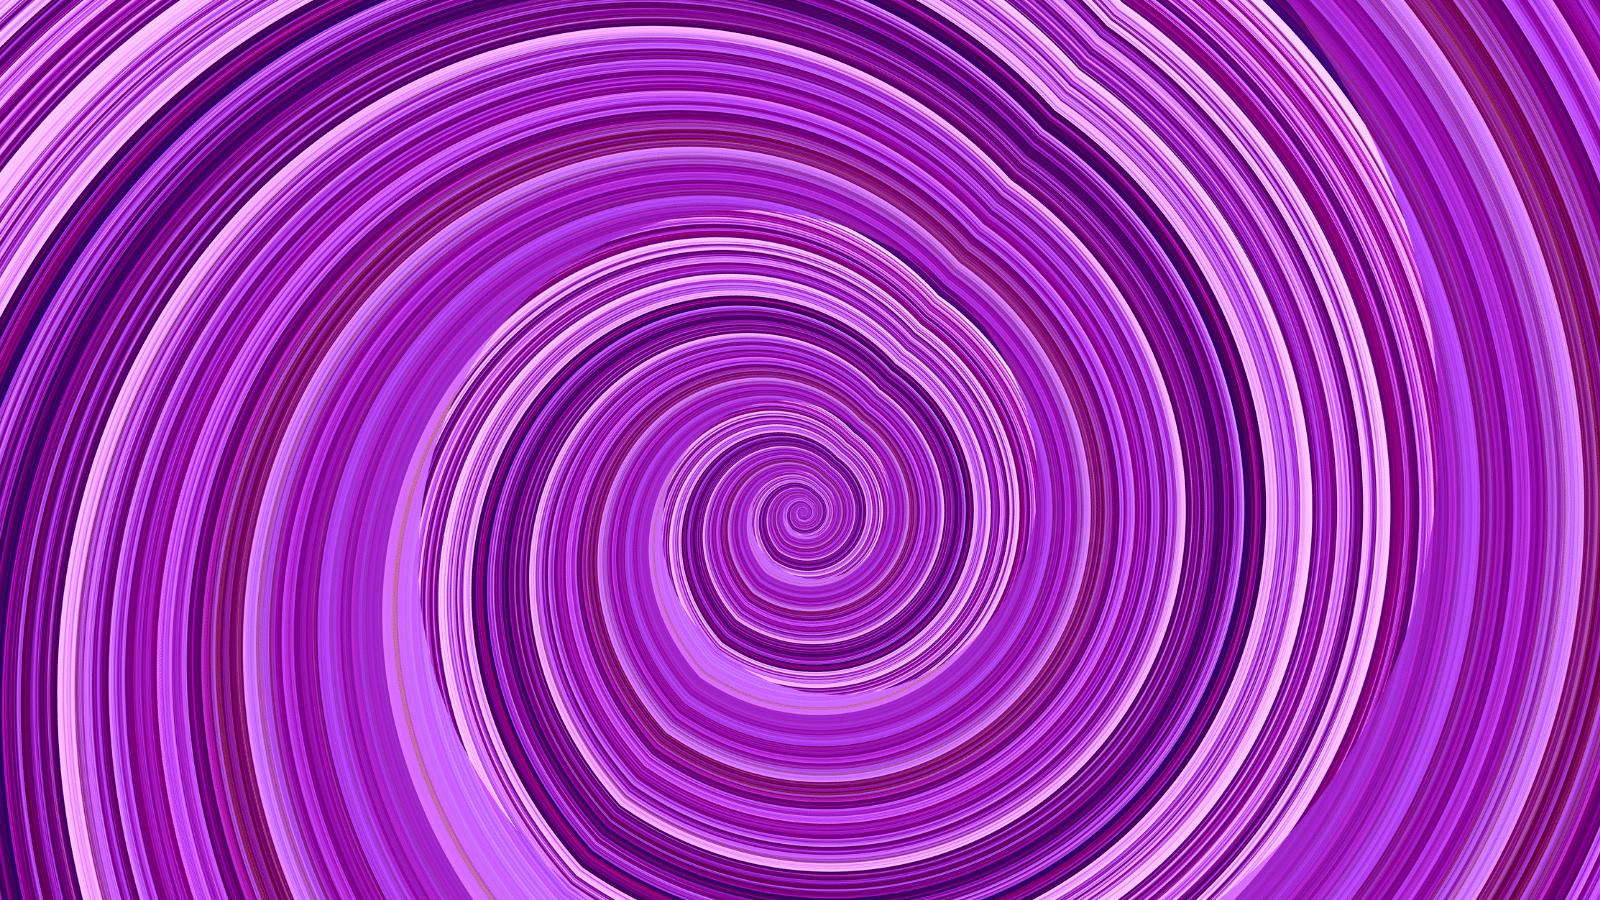 Swirls of pink and purple